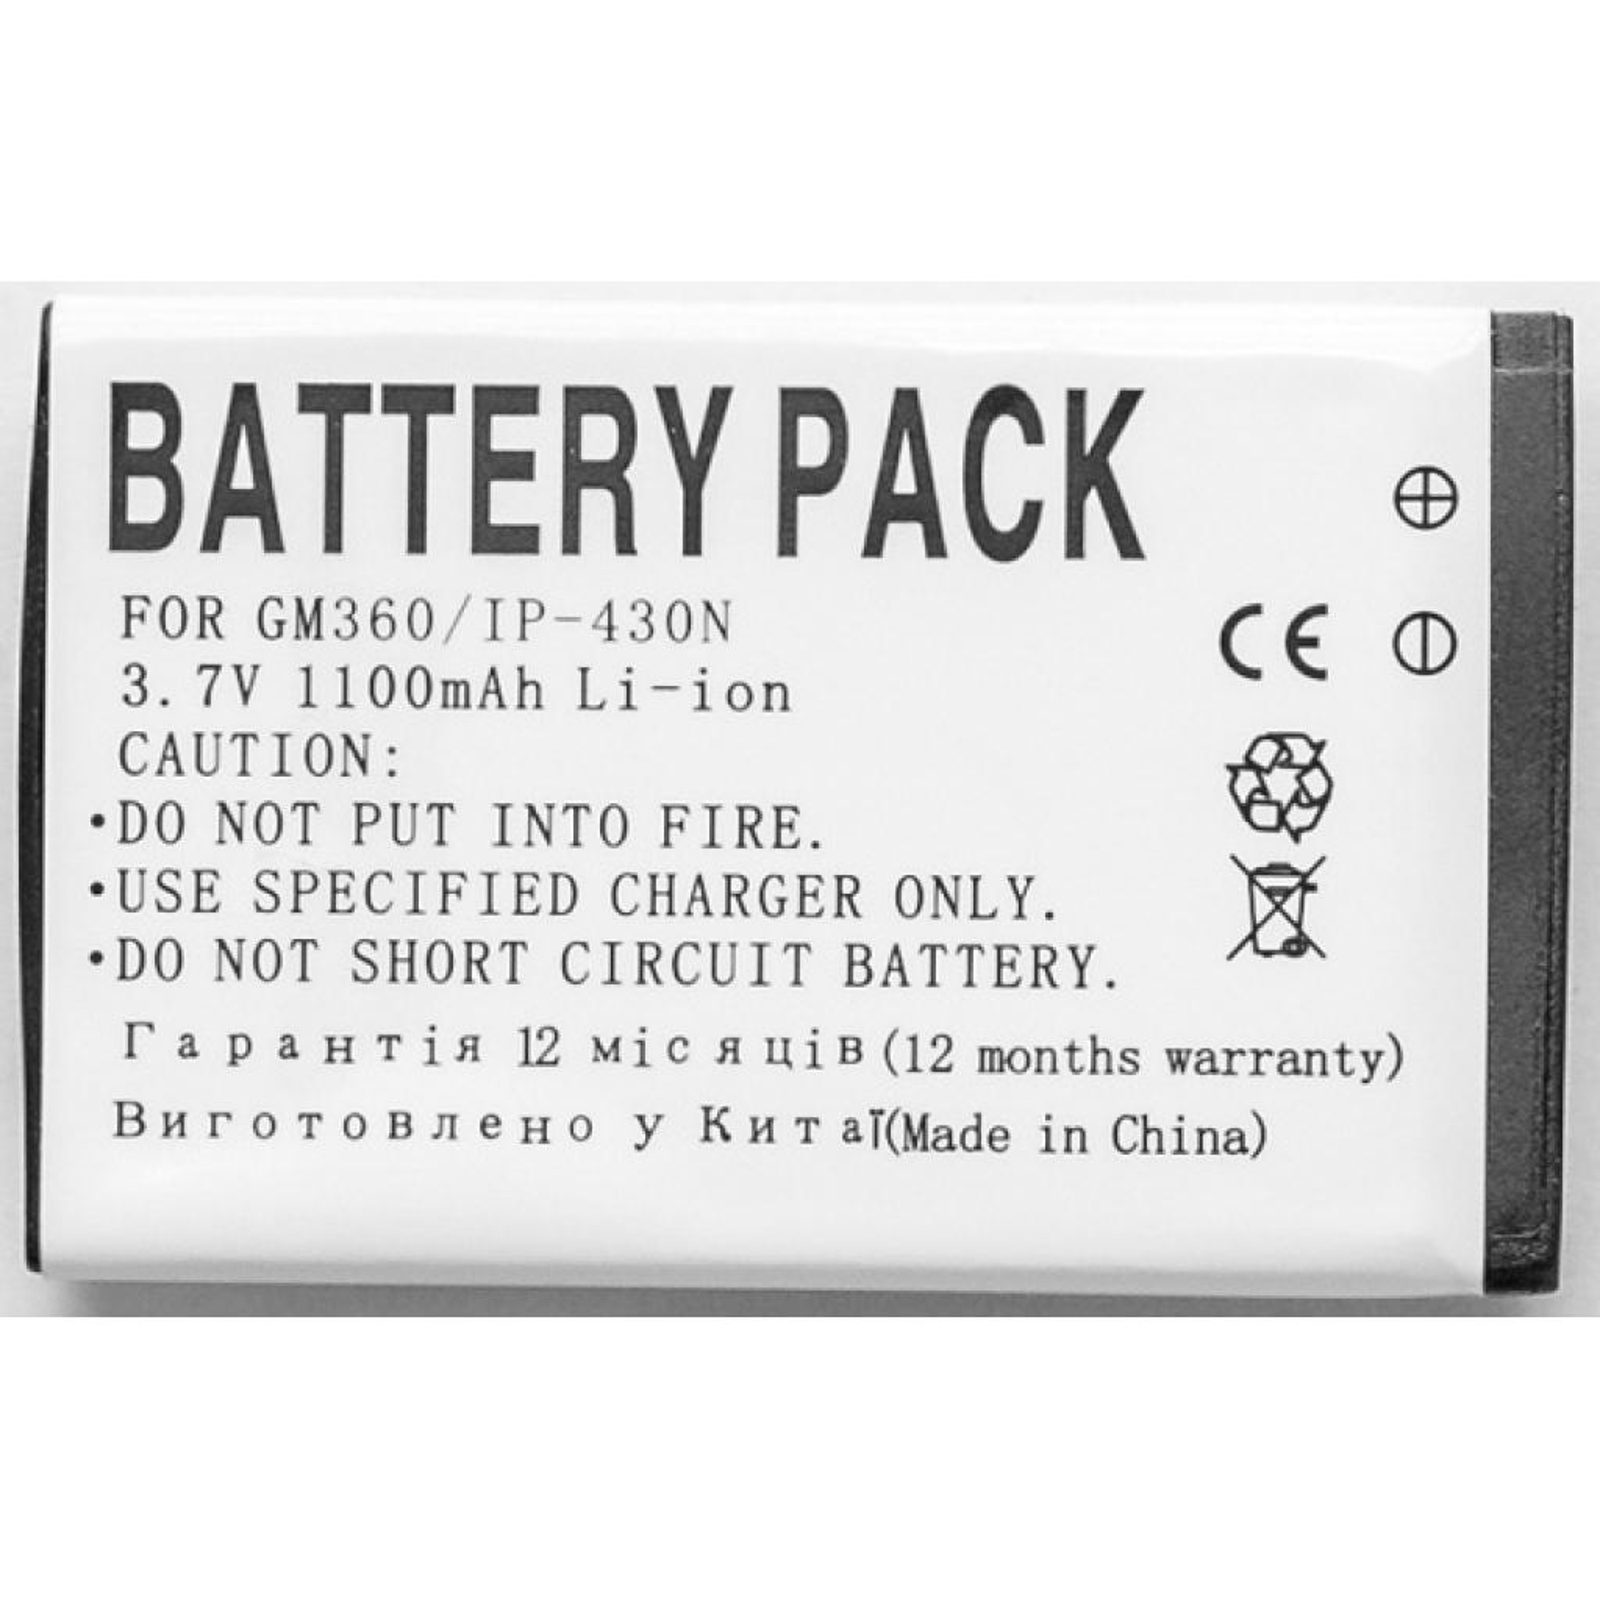 Аккумуляторная батарея PowerPlant LG IP-430N (GM360) (DV00DV6137) изображение 2